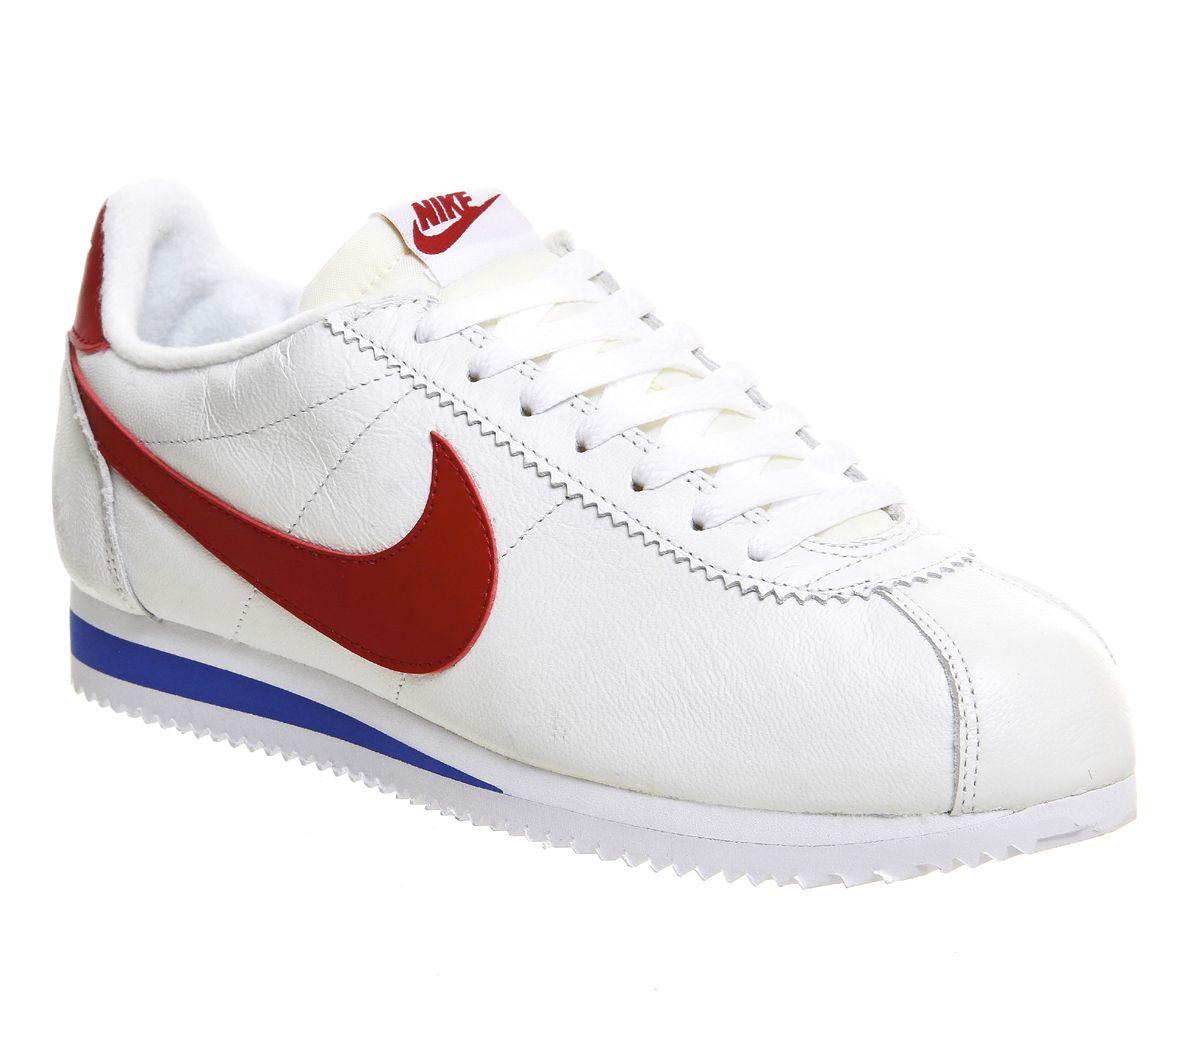 Nike Classic Cortez Og Unisex Sports L2r5397 White Varsity Red Royal Prem